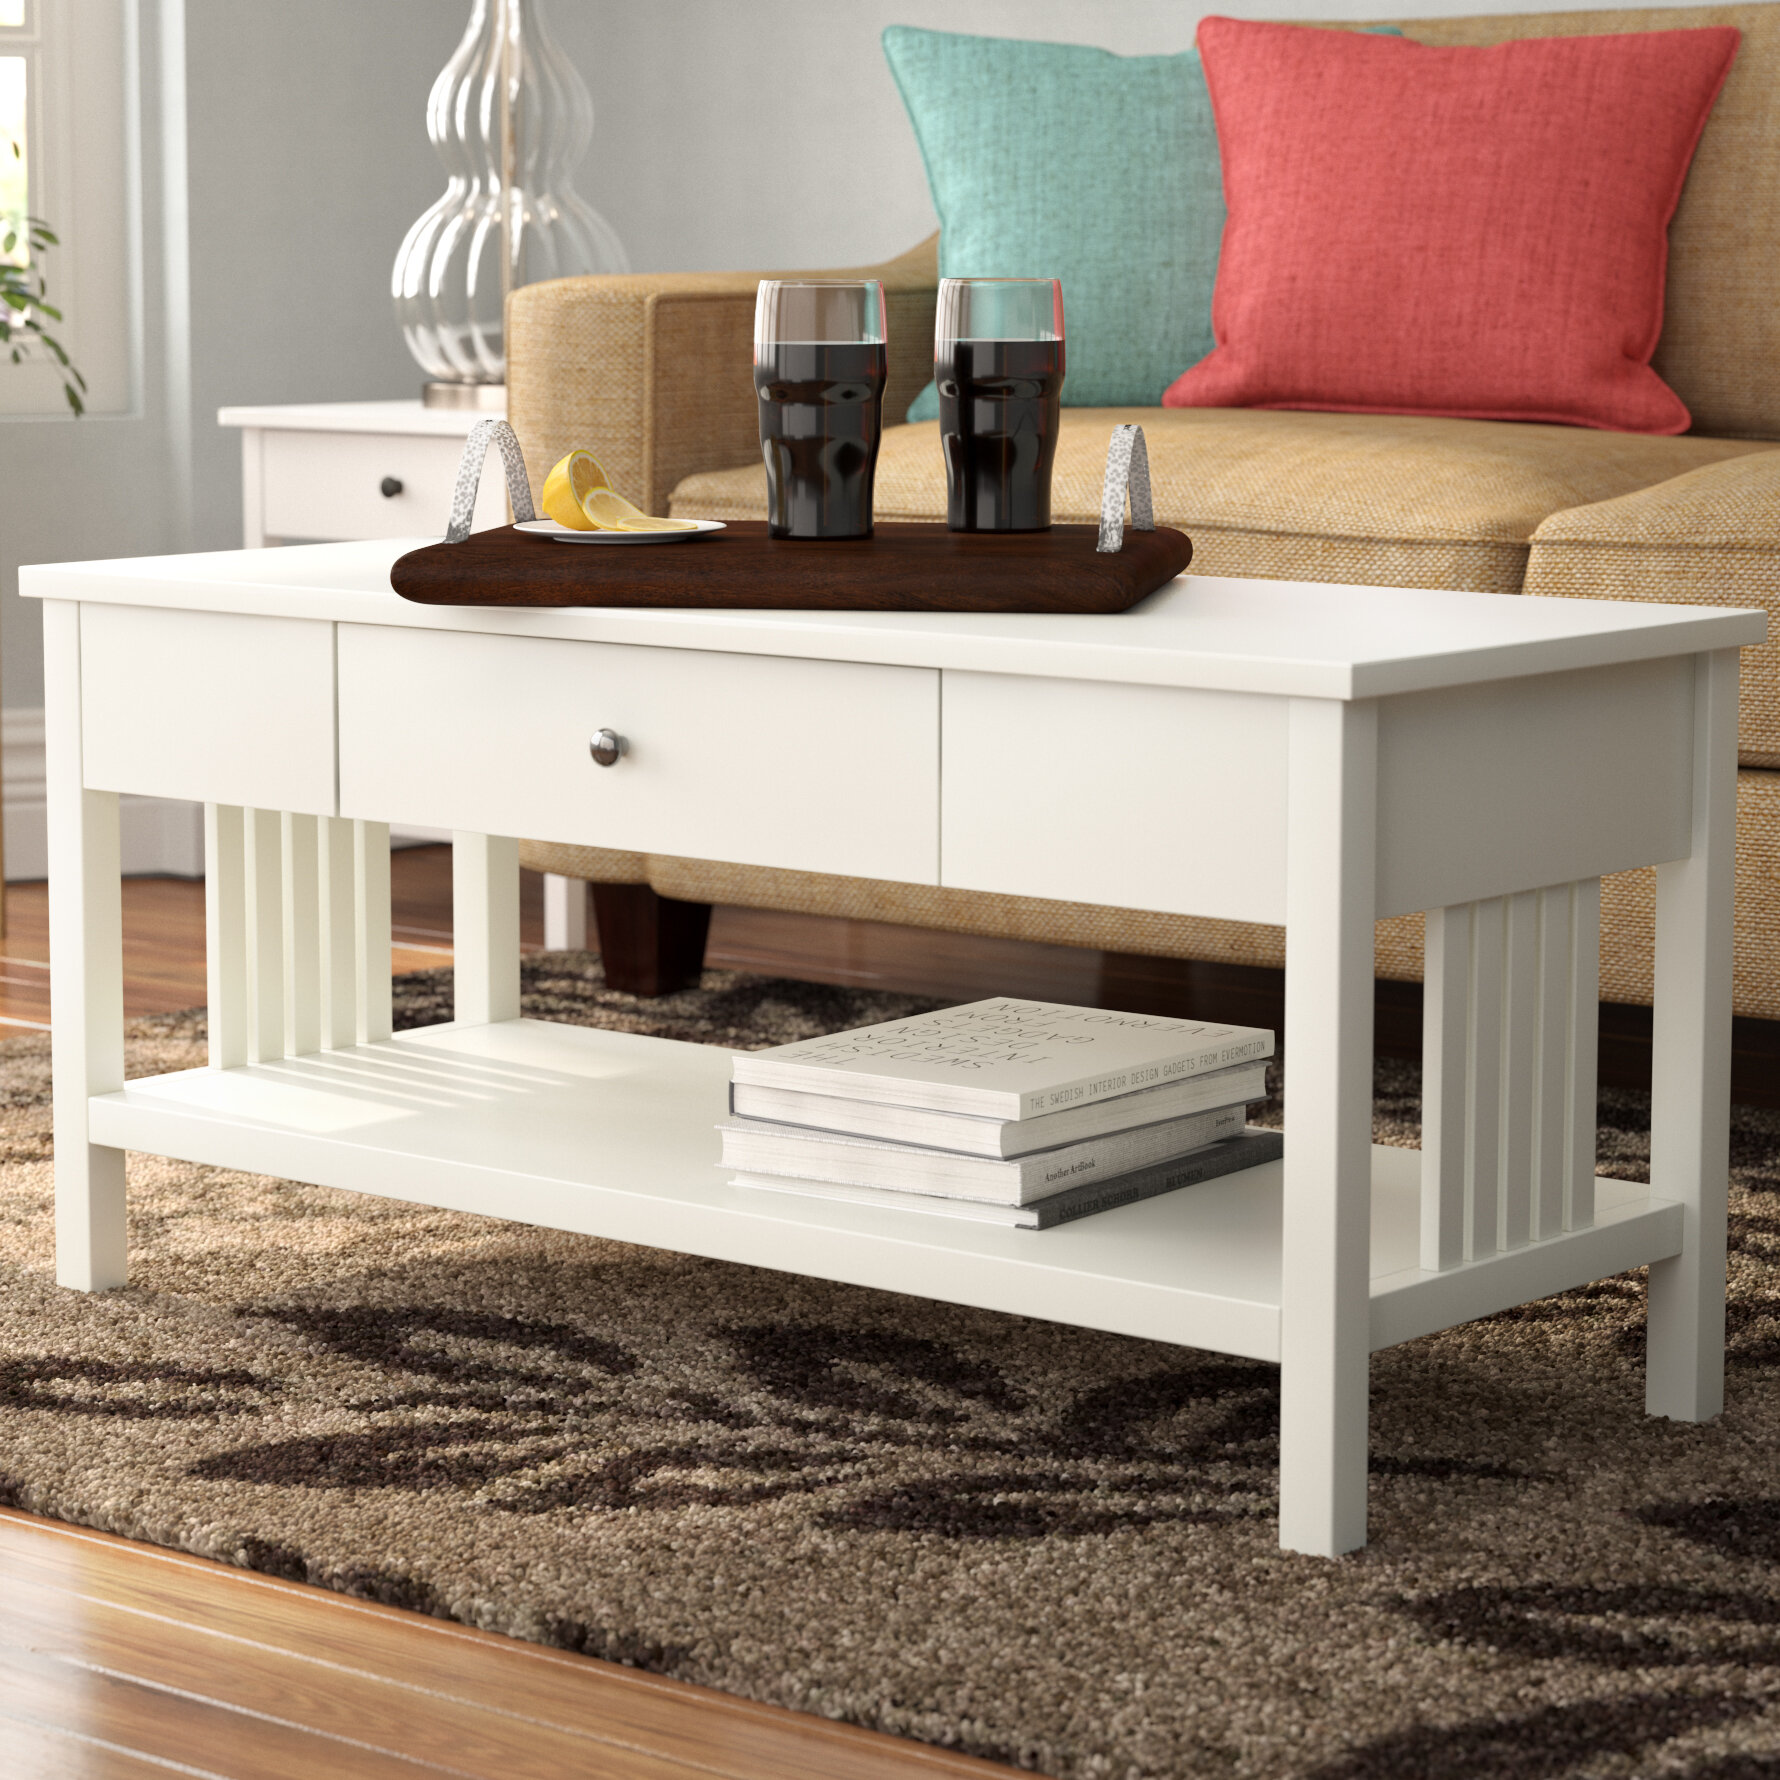 Superieur Red Barrel Studio Bechtel Mission Style Wood Coffee Table U0026 Reviews |  Wayfair